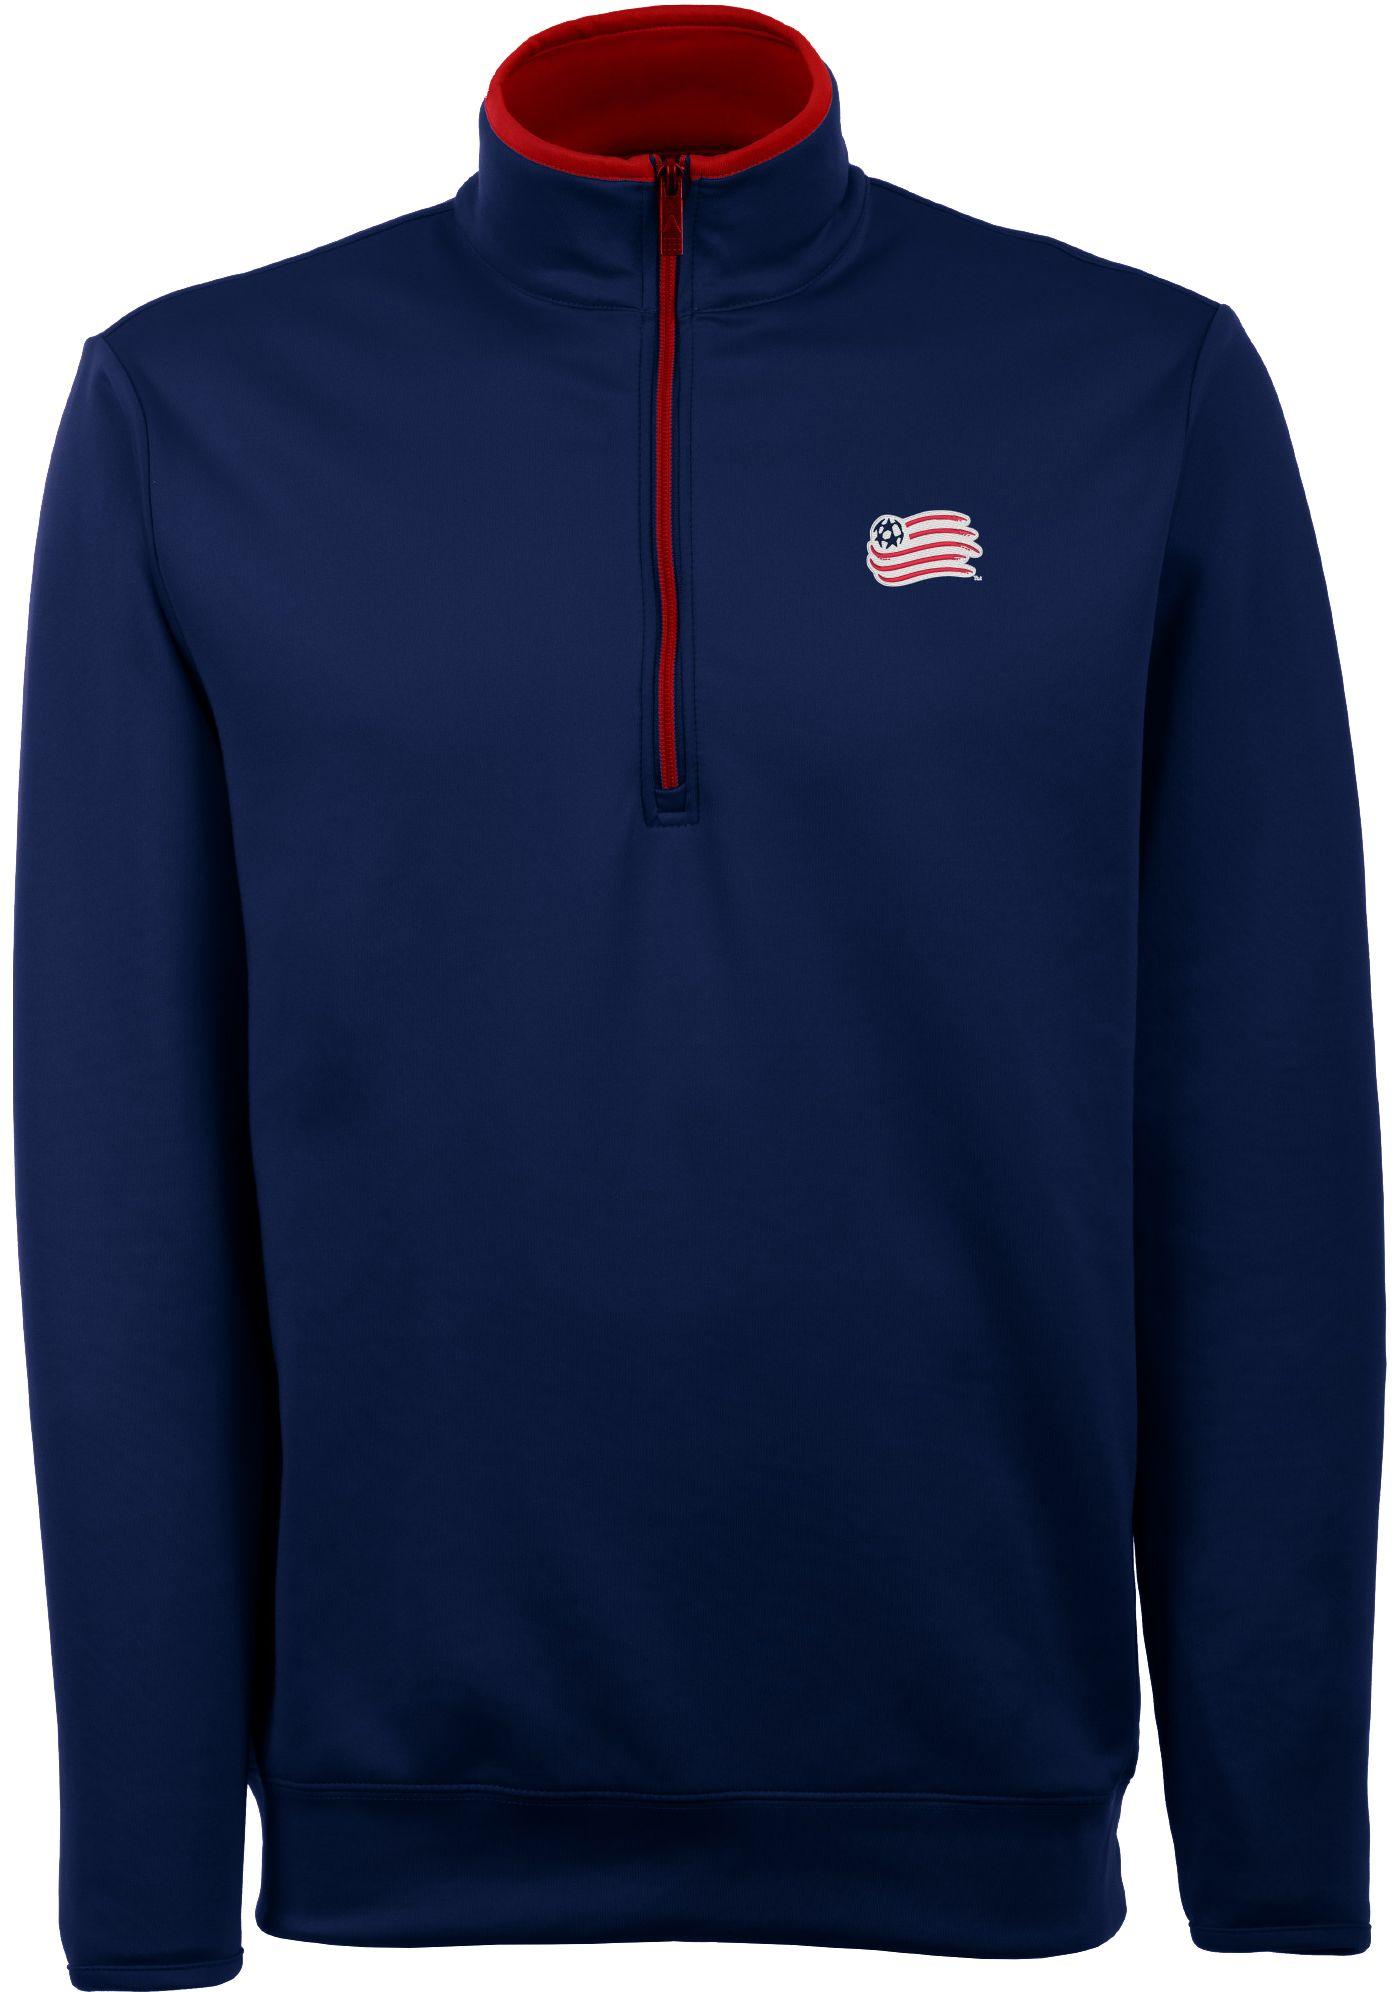 Antigua Men's New England Revolution Leader Navy Quarter-Zip Jacket